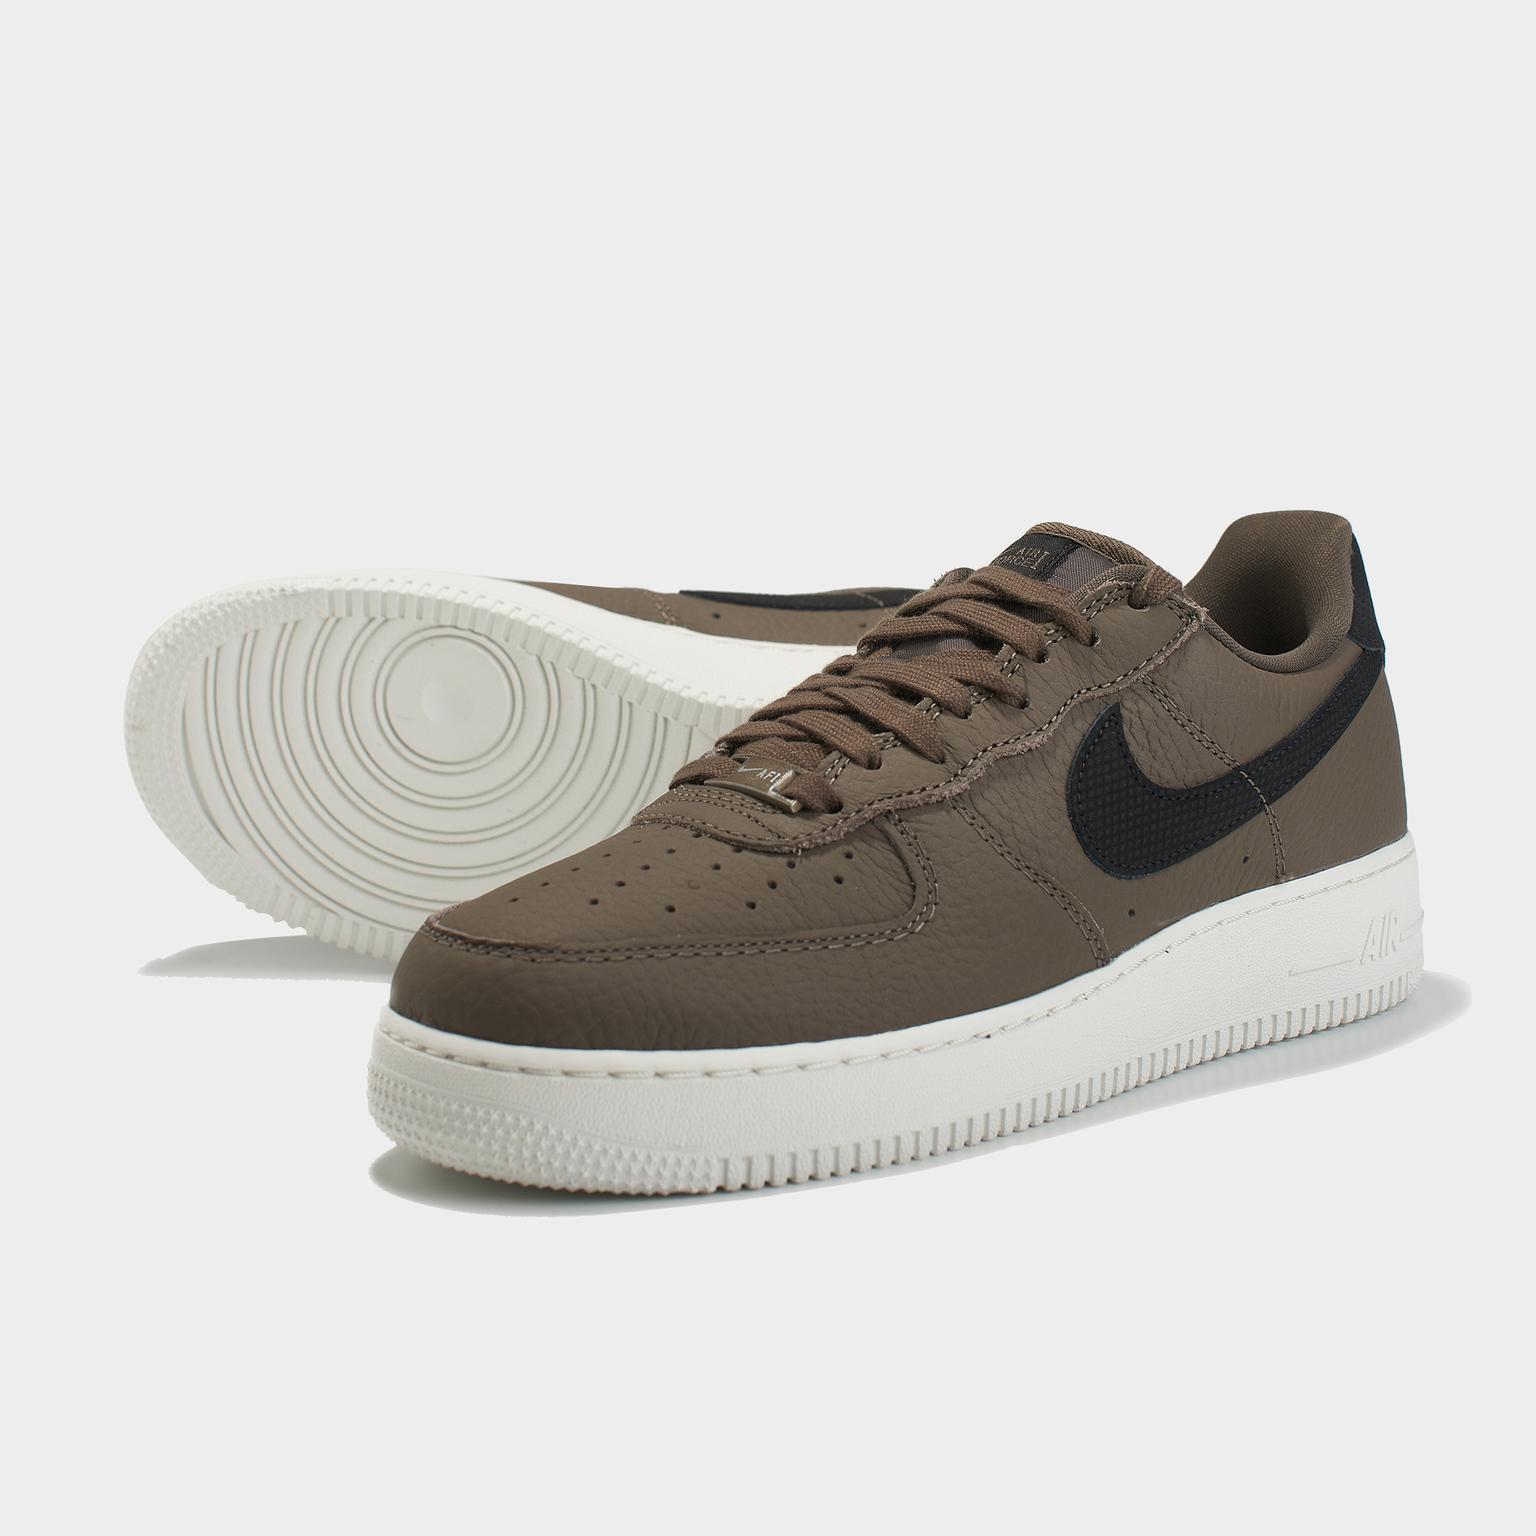 Кроссовки Nike Air Force 1 07 Craft CT2317-200